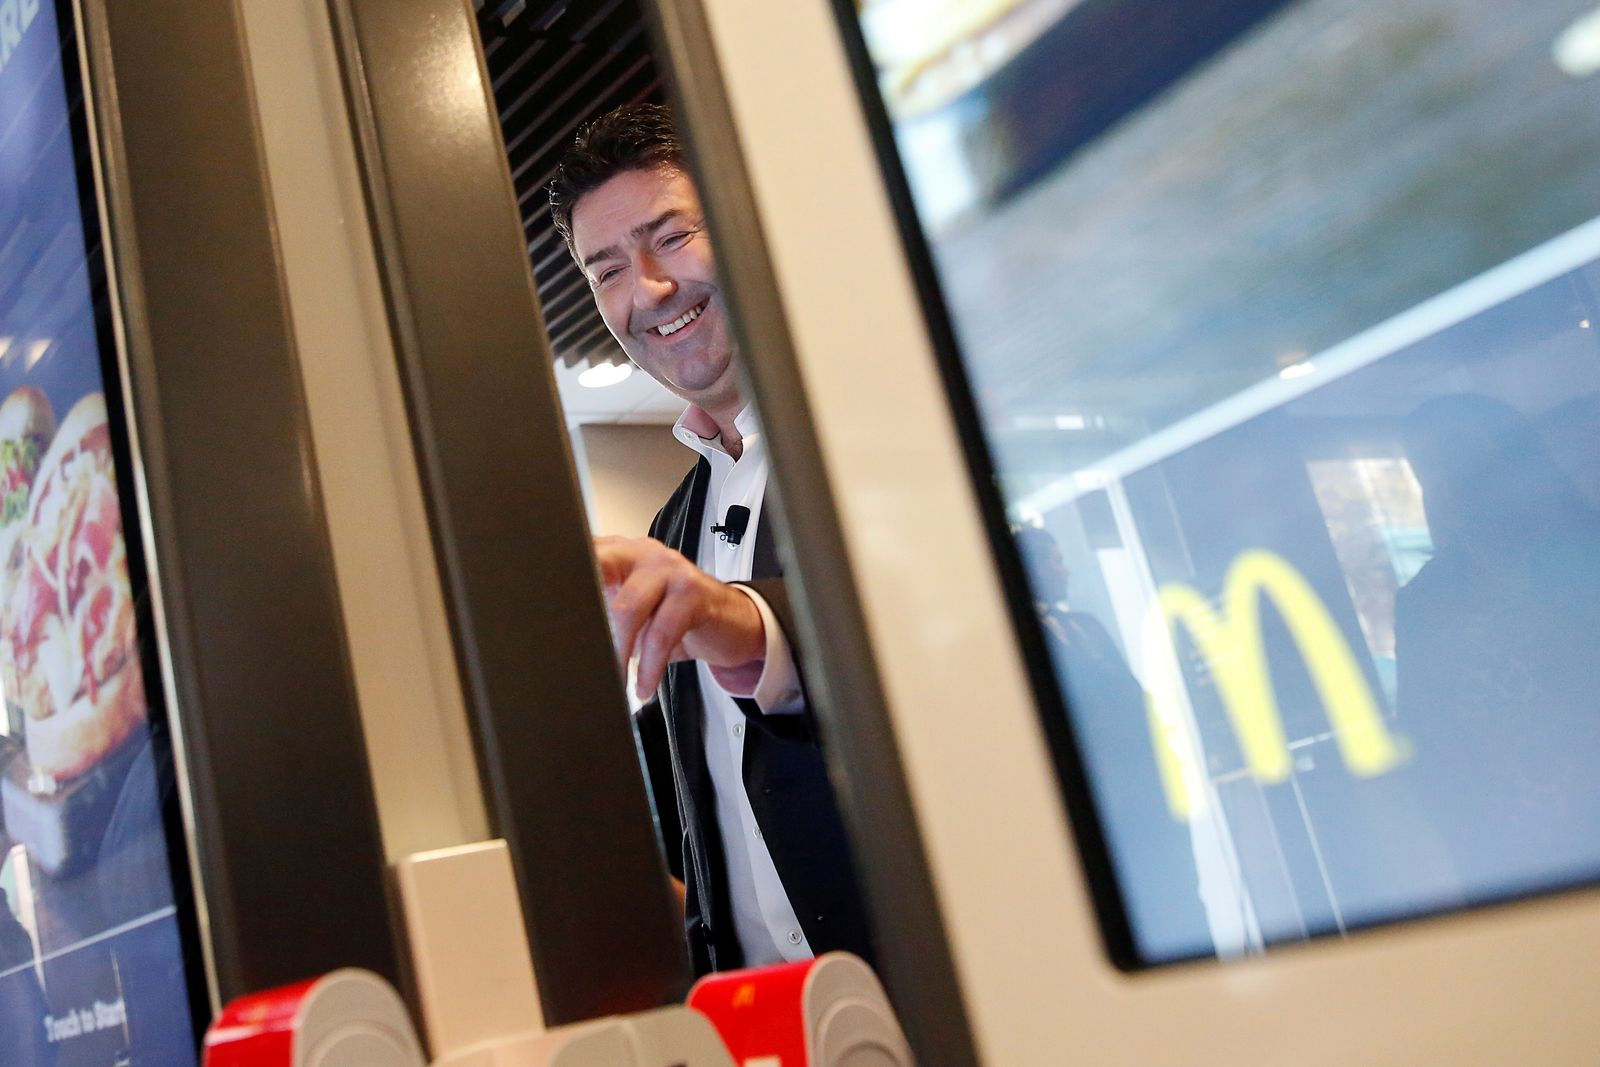 McDonalds CEO Steve Easterbrook